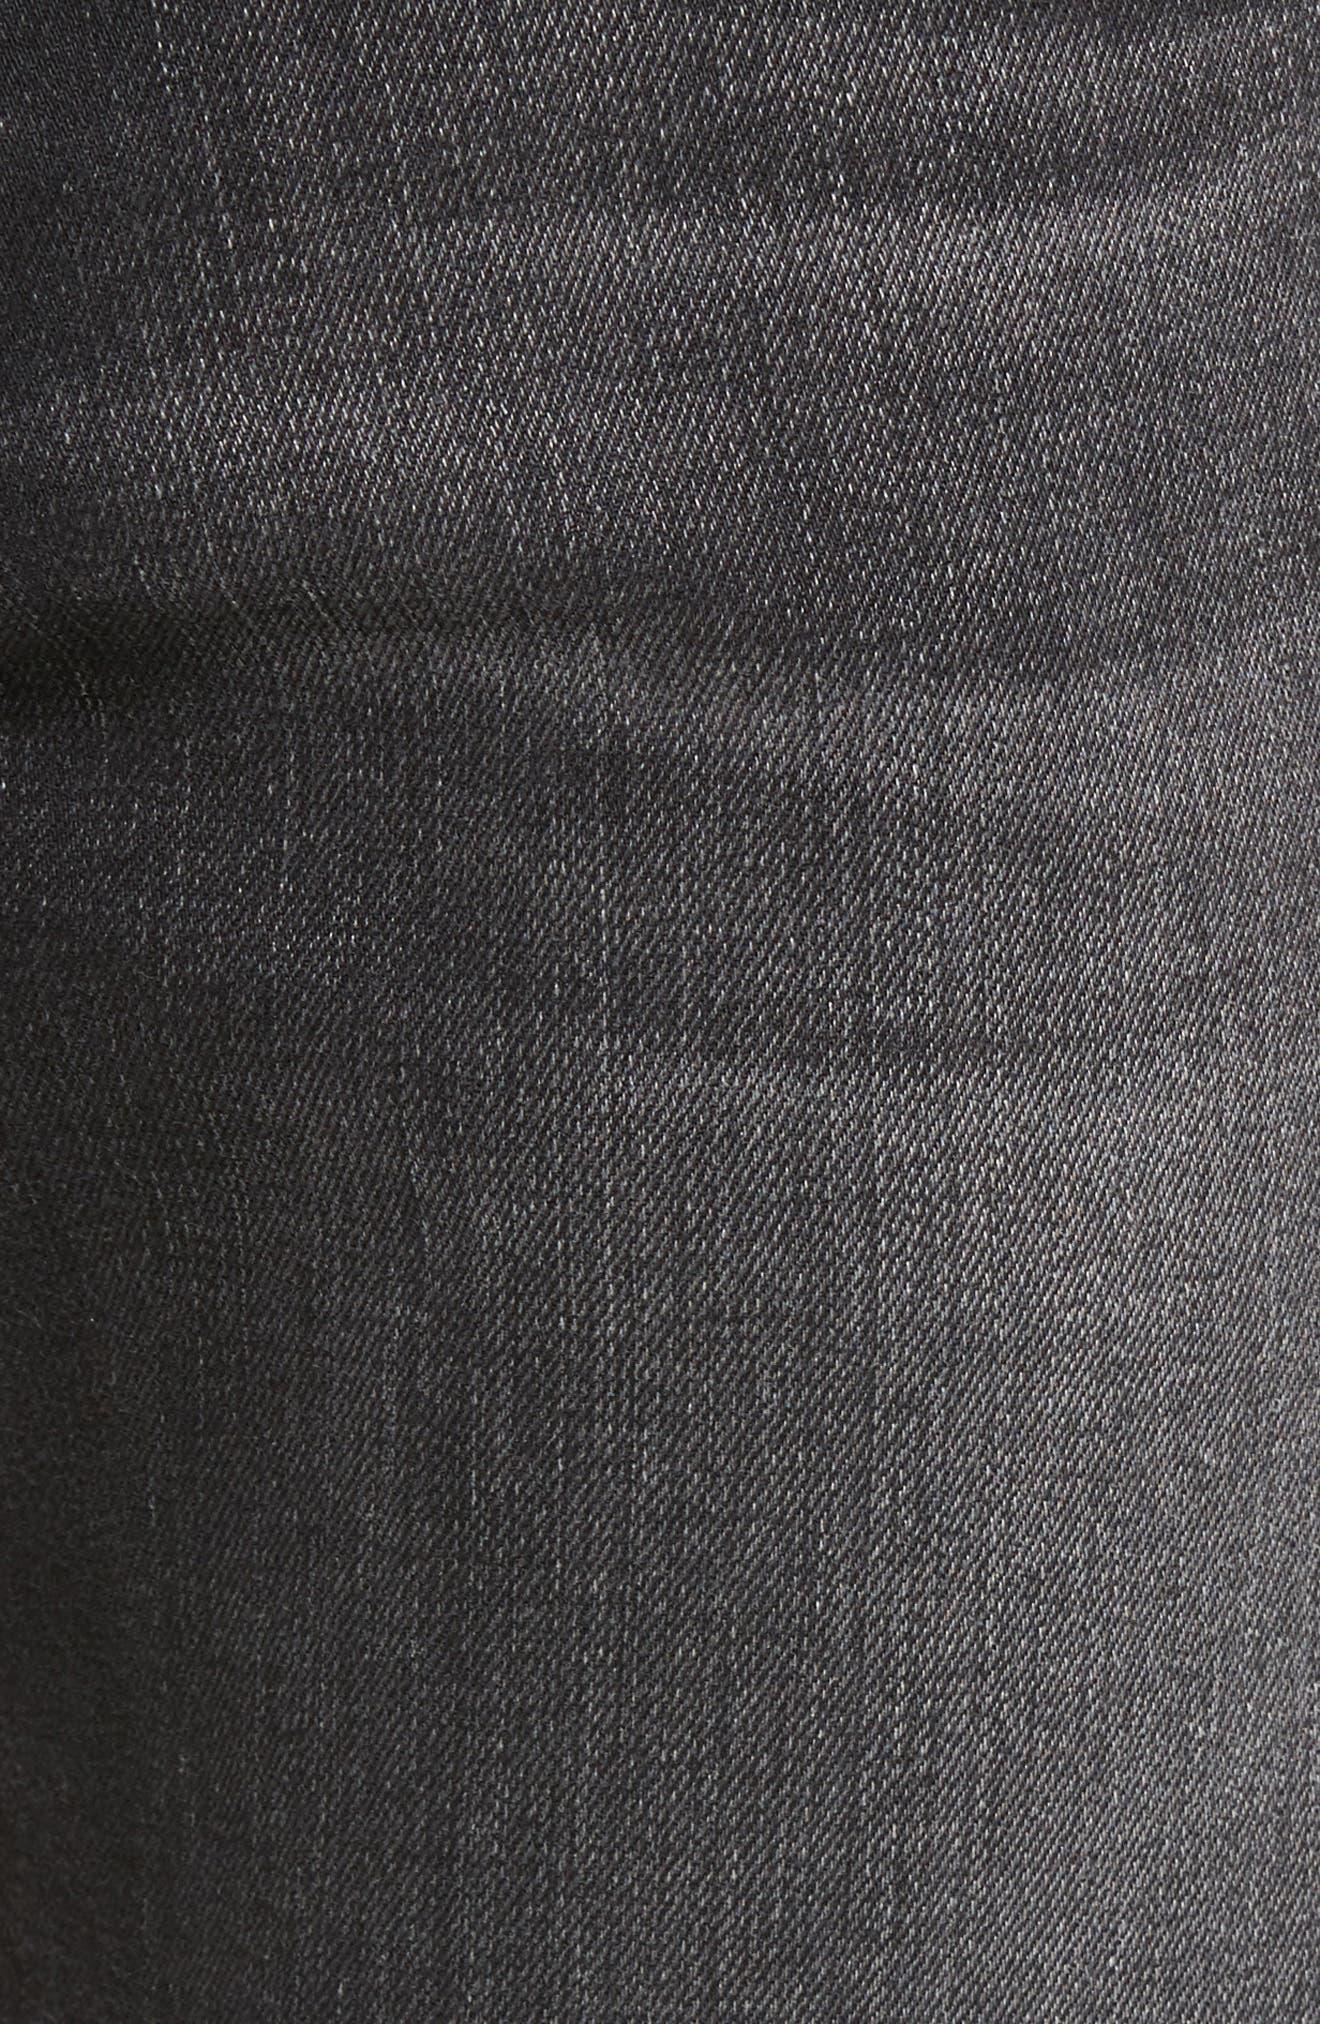 Tellis Modern Slim Fit Jeans,                             Alternate thumbnail 5, color,                             Smudged Black